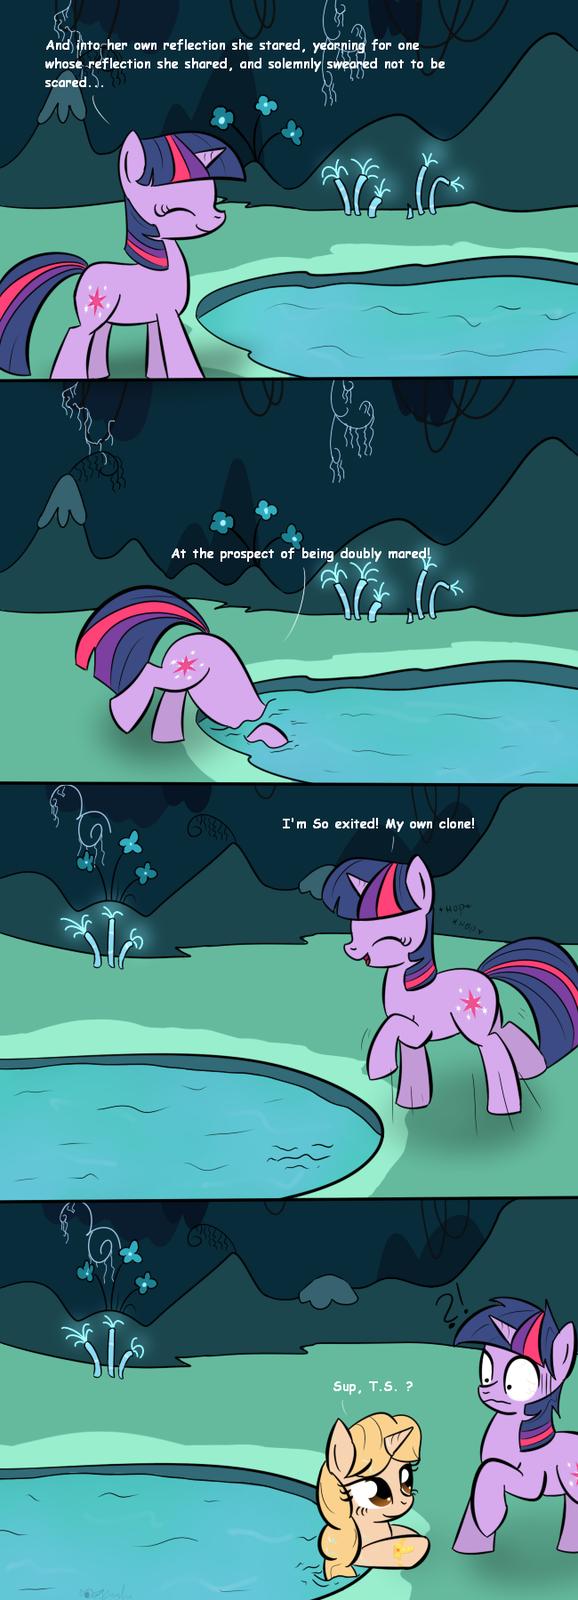 Twilight's clone